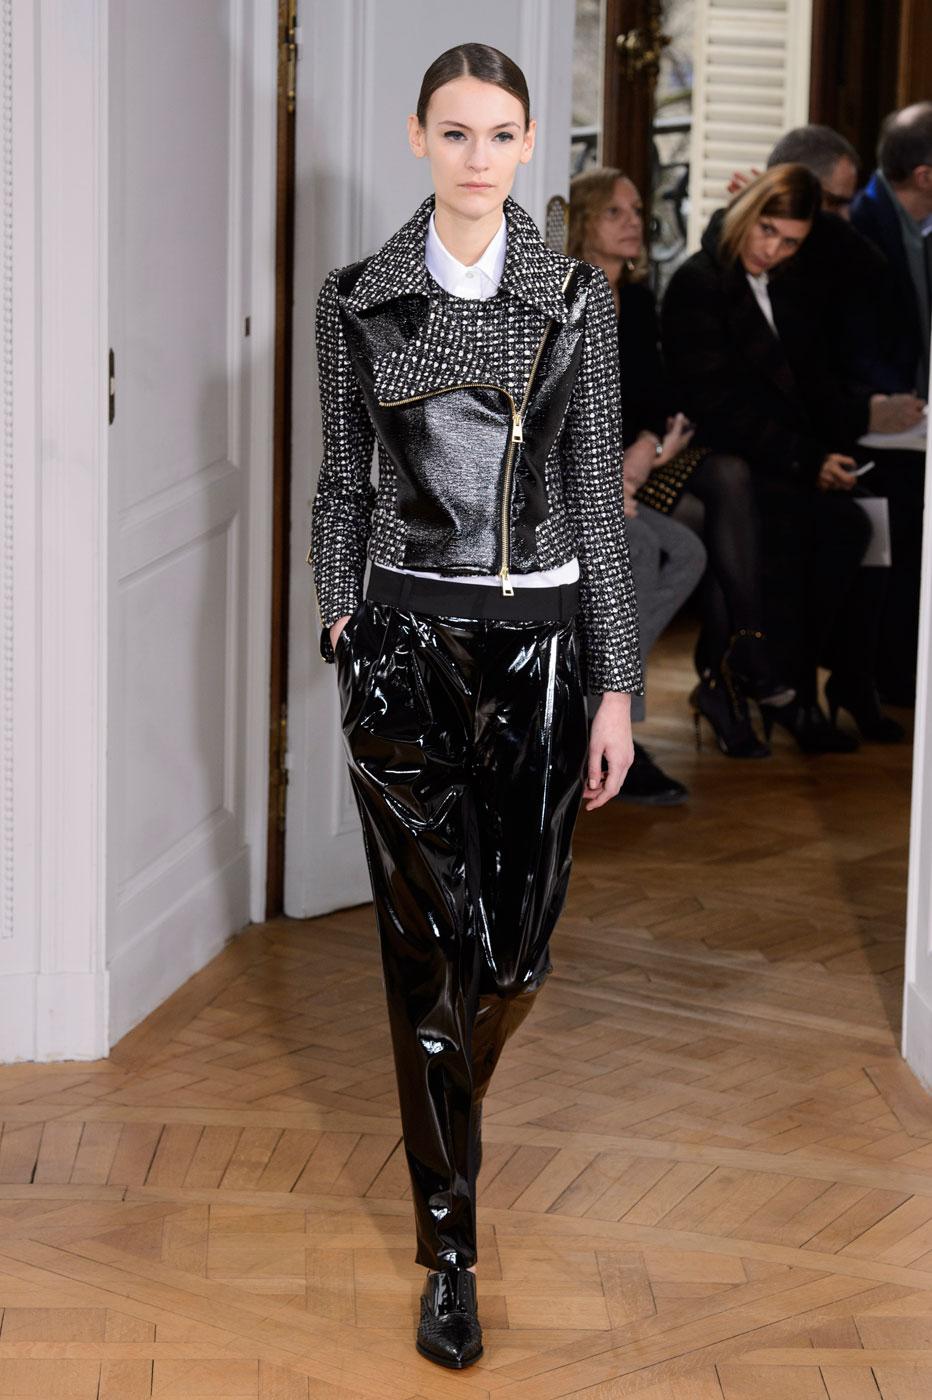 Bouchra-Jarrar-fashion-runway-show-haute-couture-paris-spring-summer-2015-the-impression-01